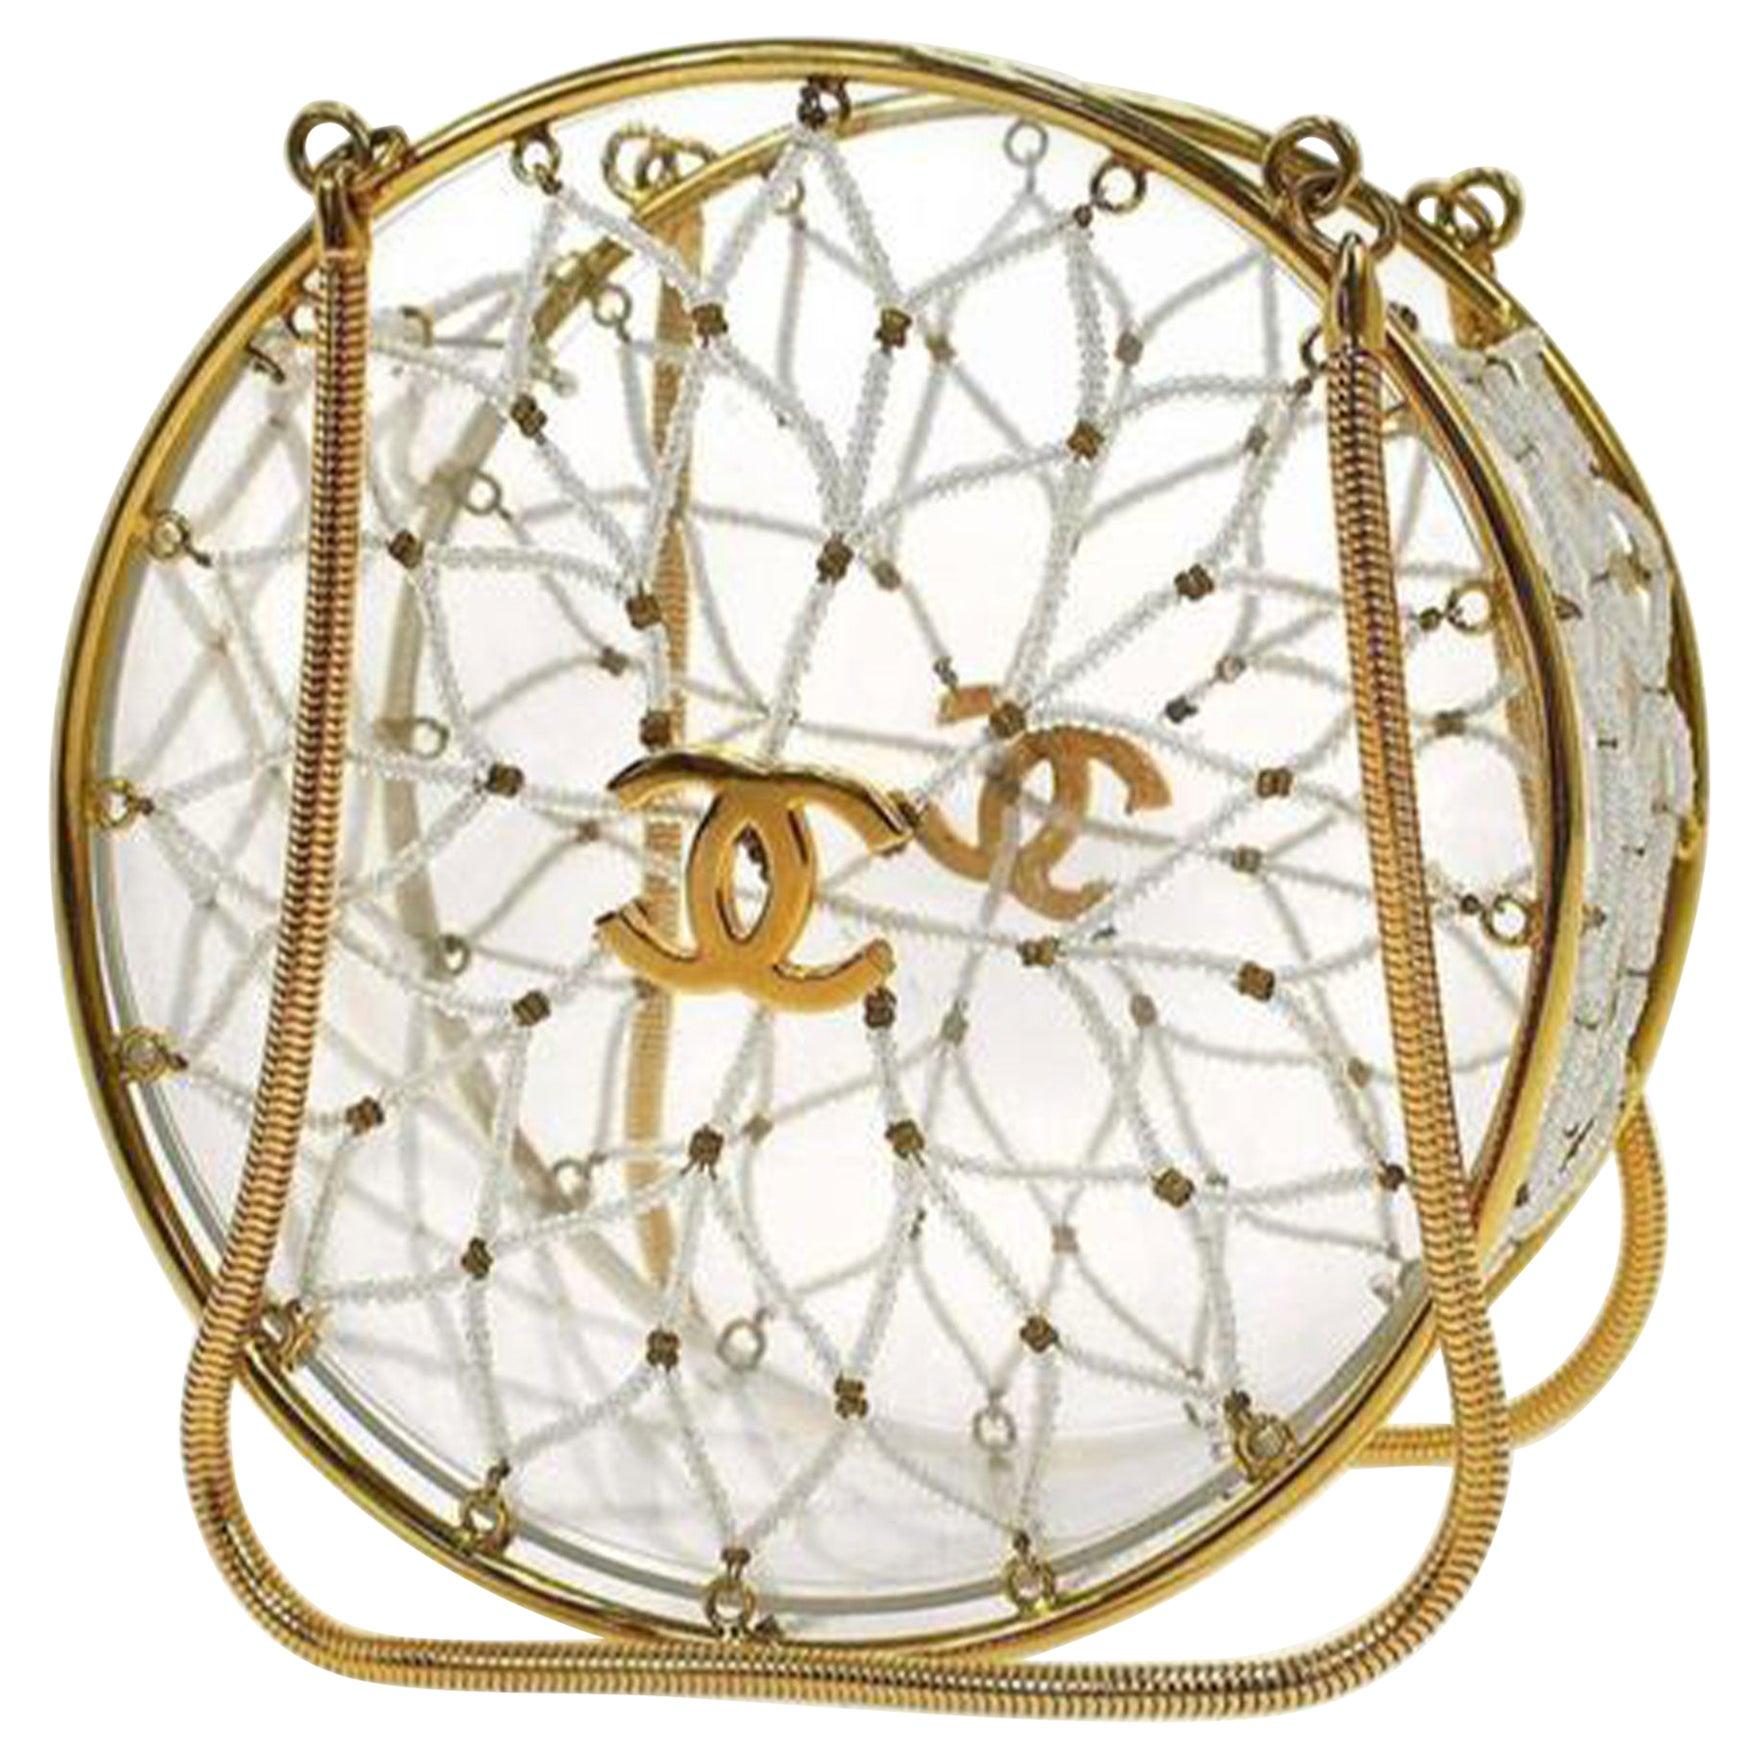 Chanel Minaudière Ultra Rare 1990 Beaded Gold Transparent Circle Micro Mini Bag